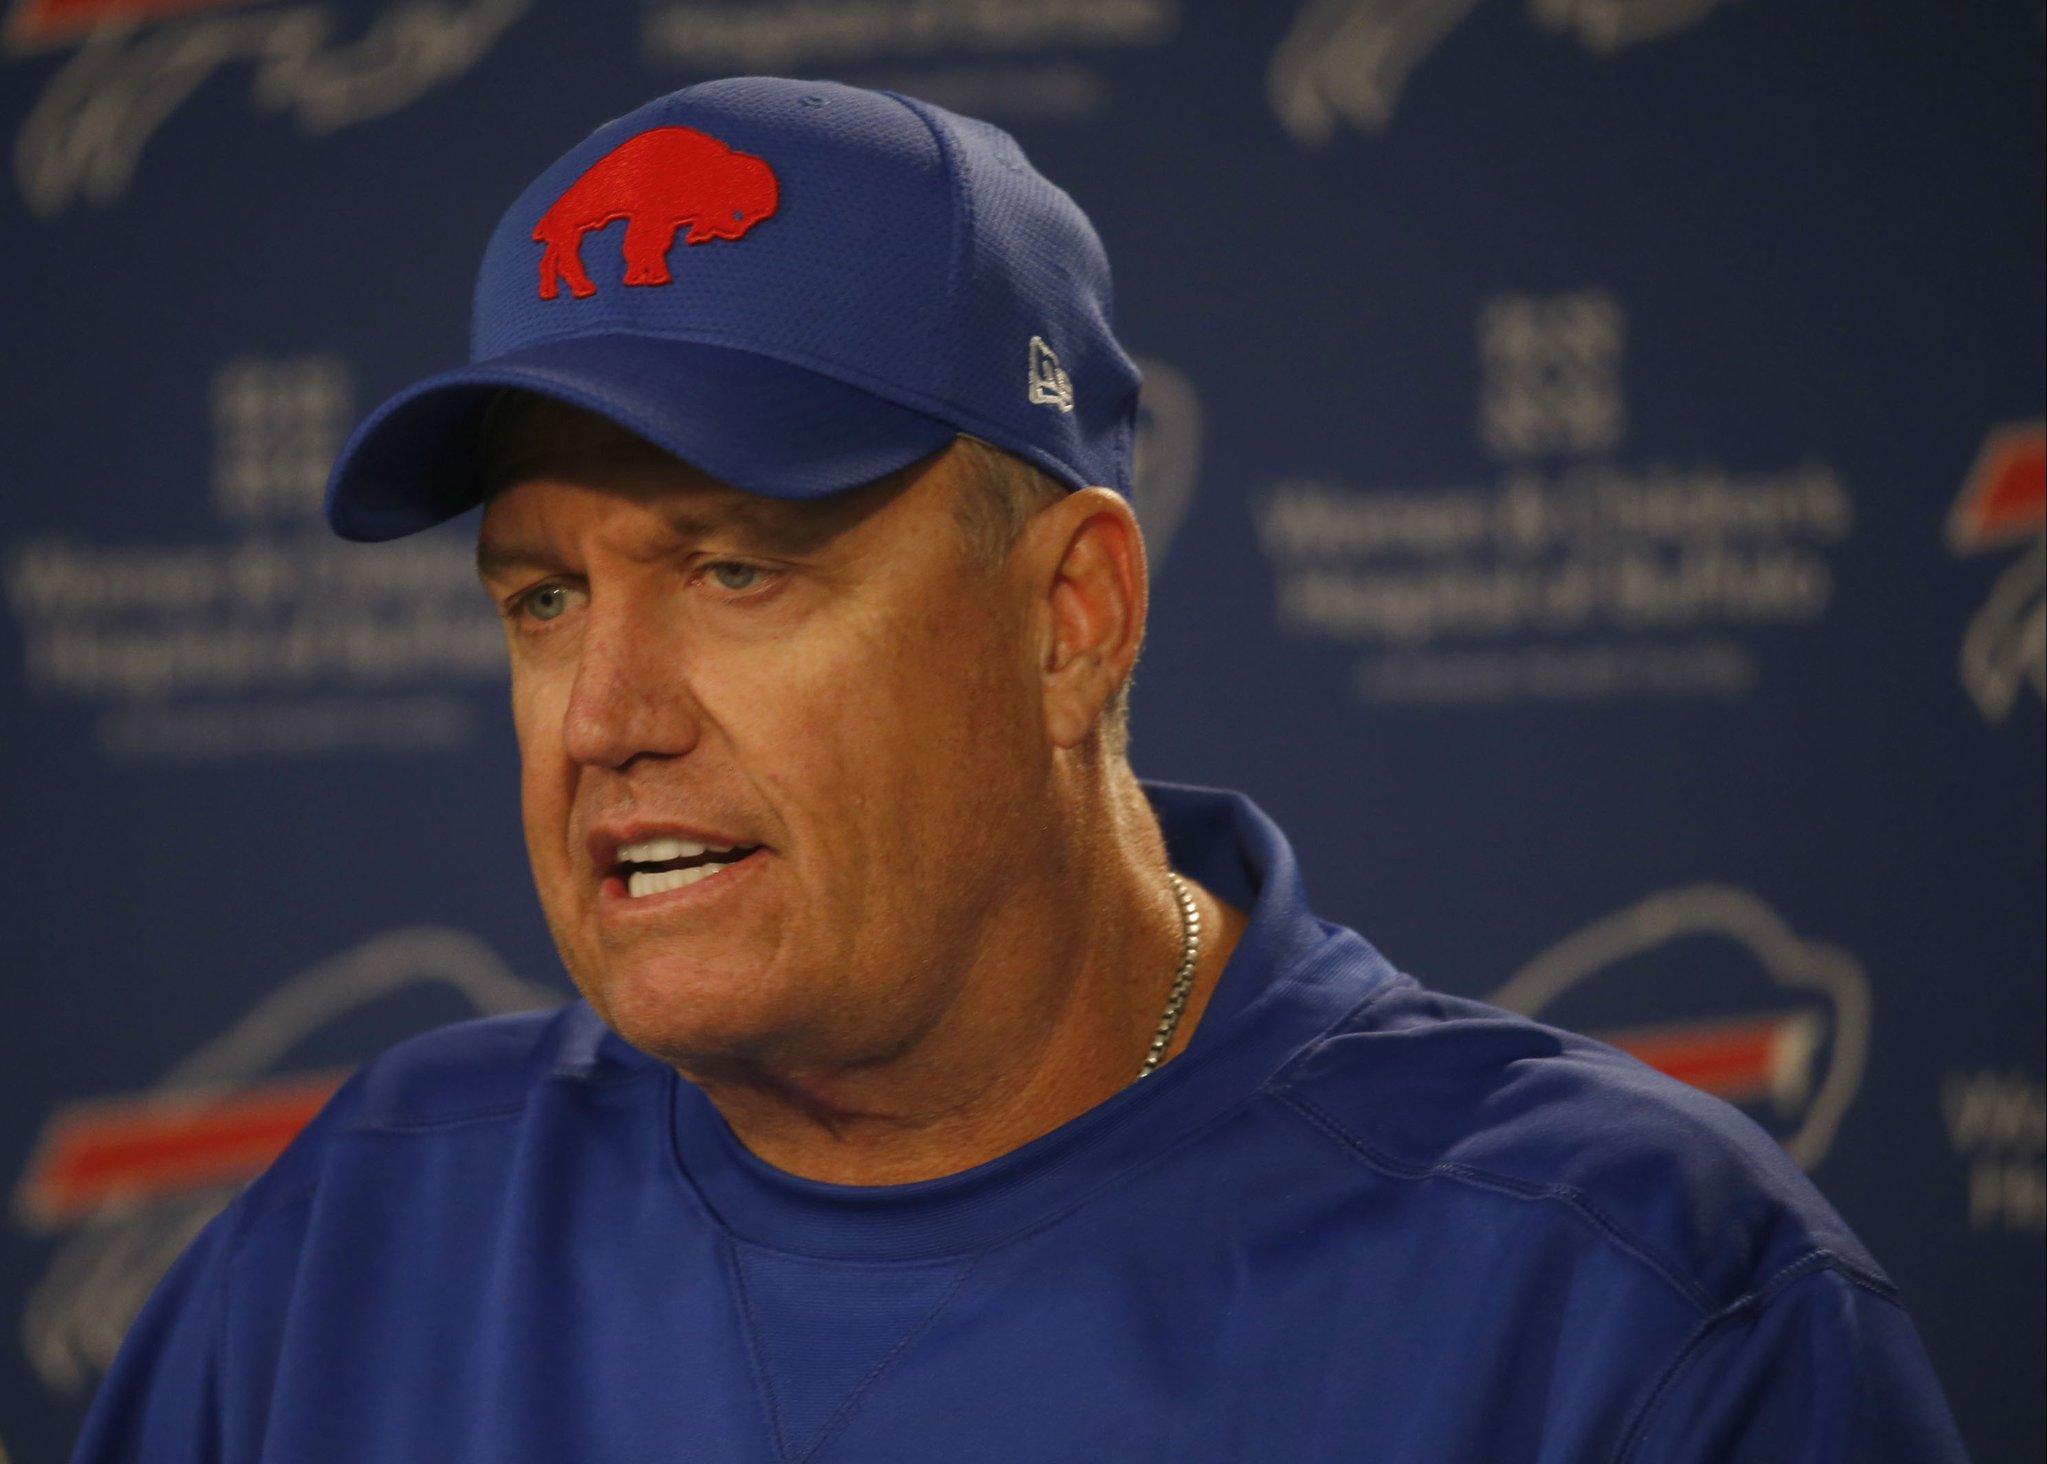 Rex Ryan during his weekly Wednesday press conference at One Bills Drive. (Robert Kirkham/Buffalo News)